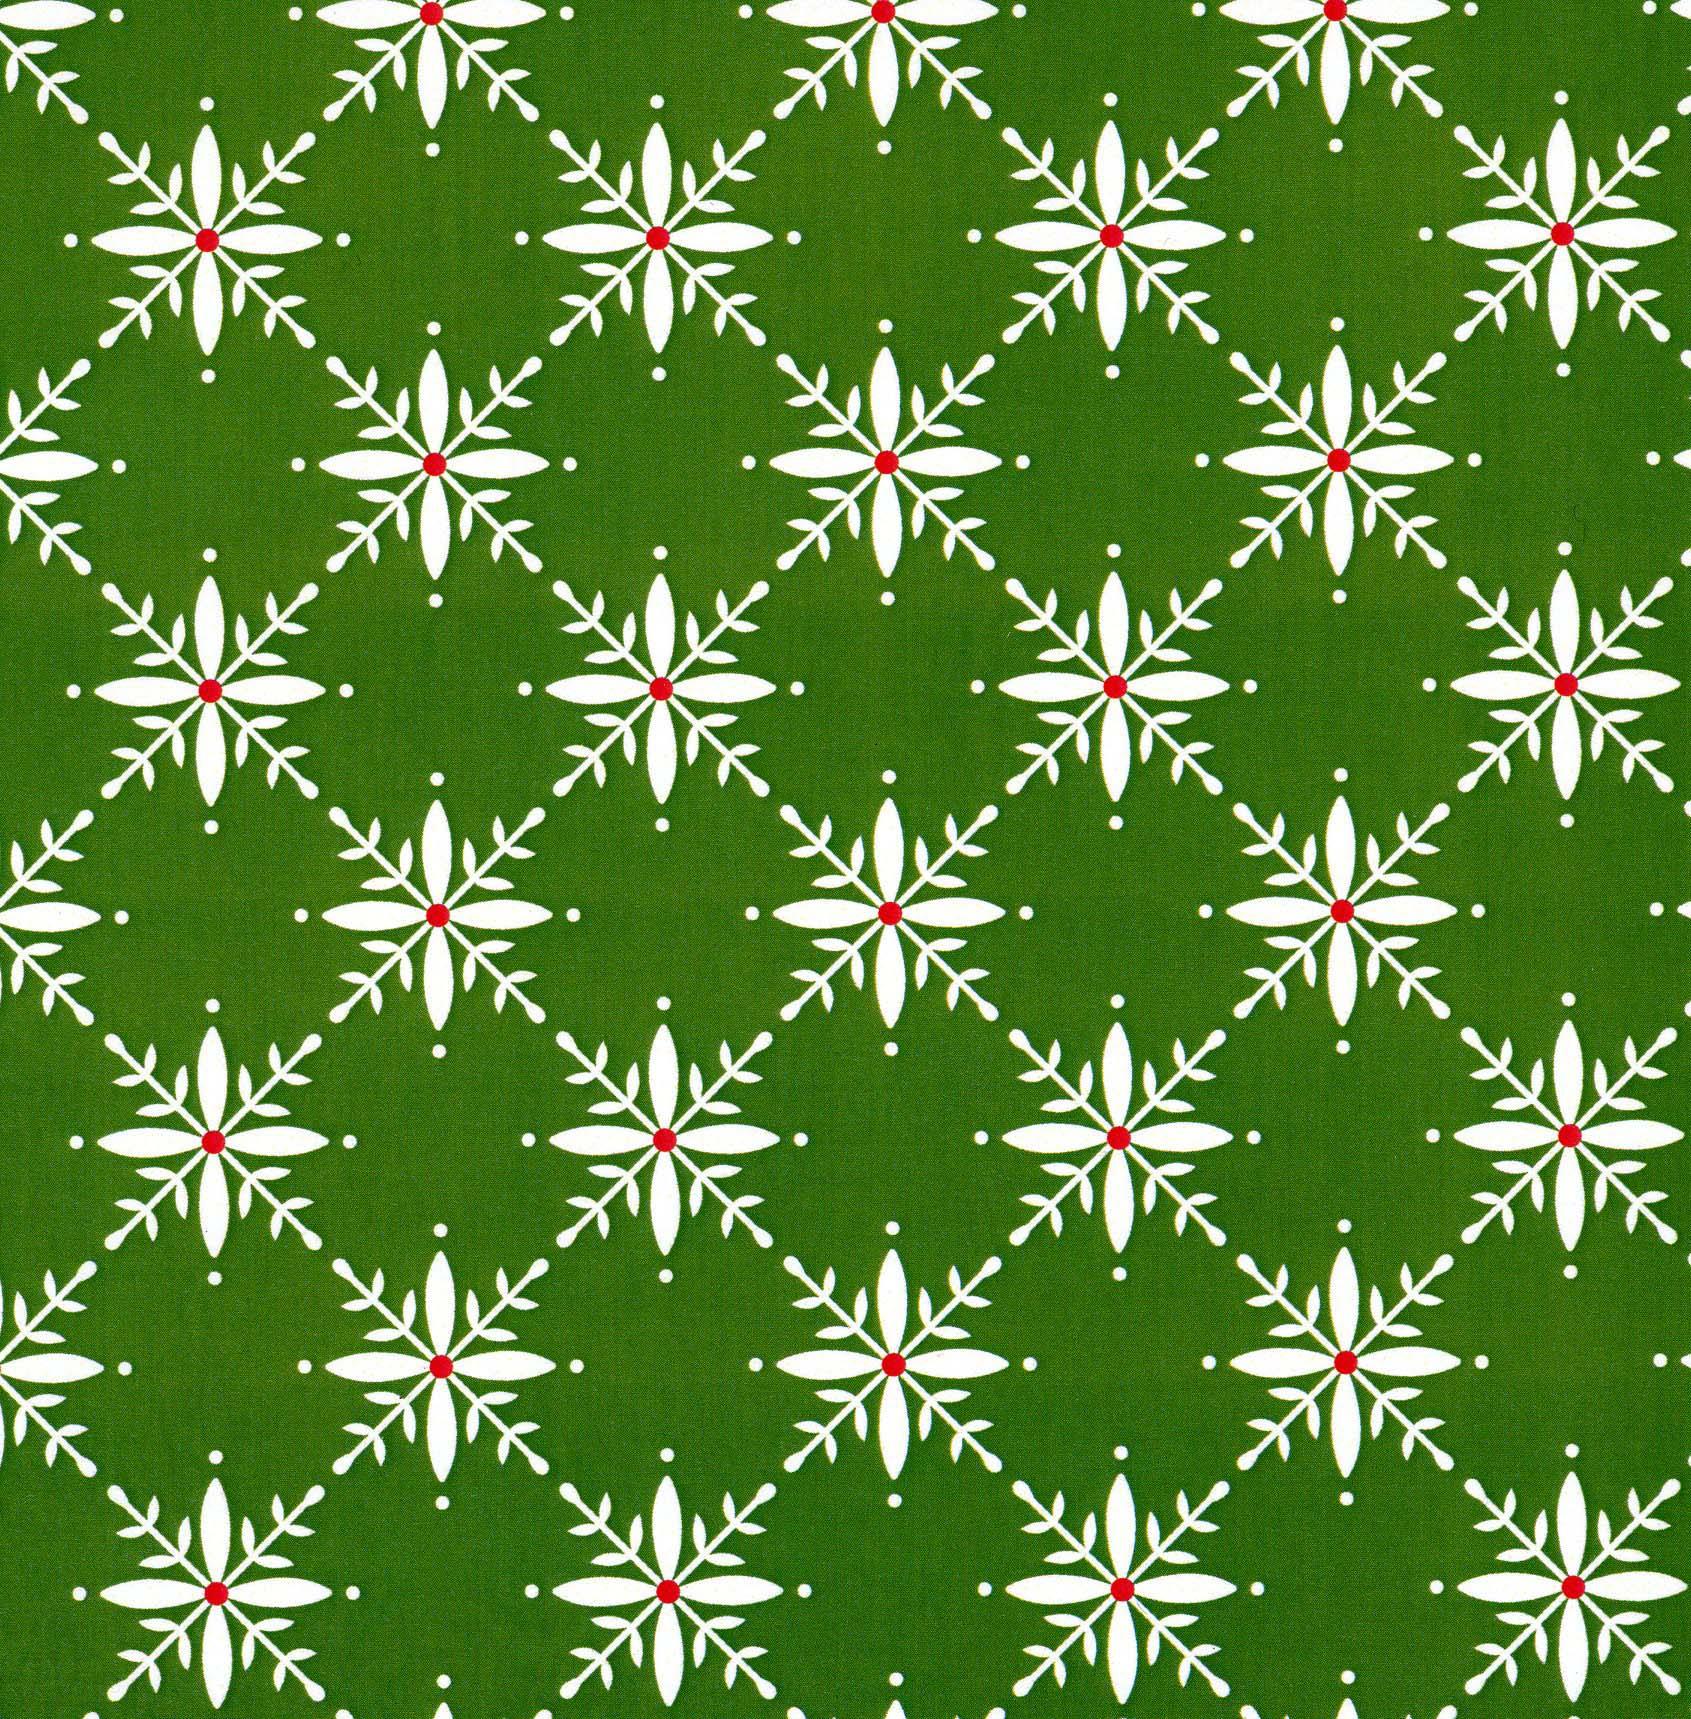 sd flower flake wrap034REV.jpg